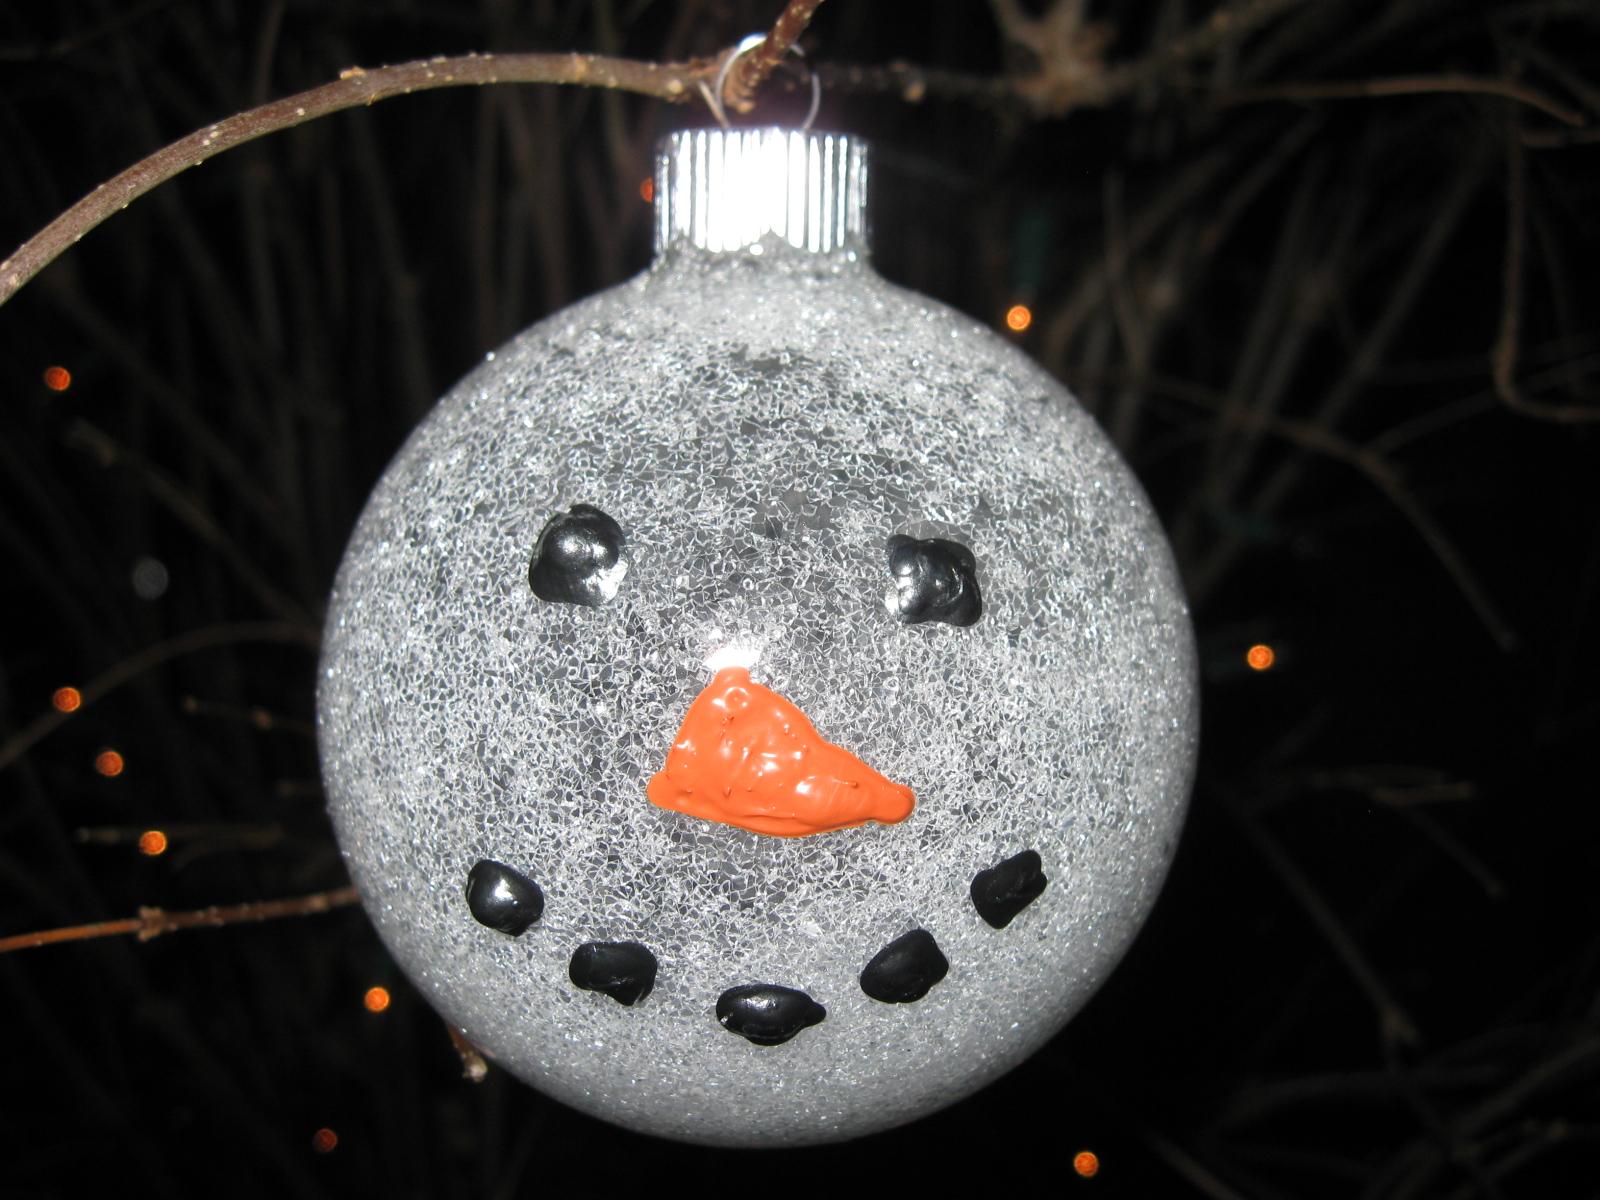 Craft klatch snowman glitter ball ornament craft tutorial for Clear ornament snowman craft